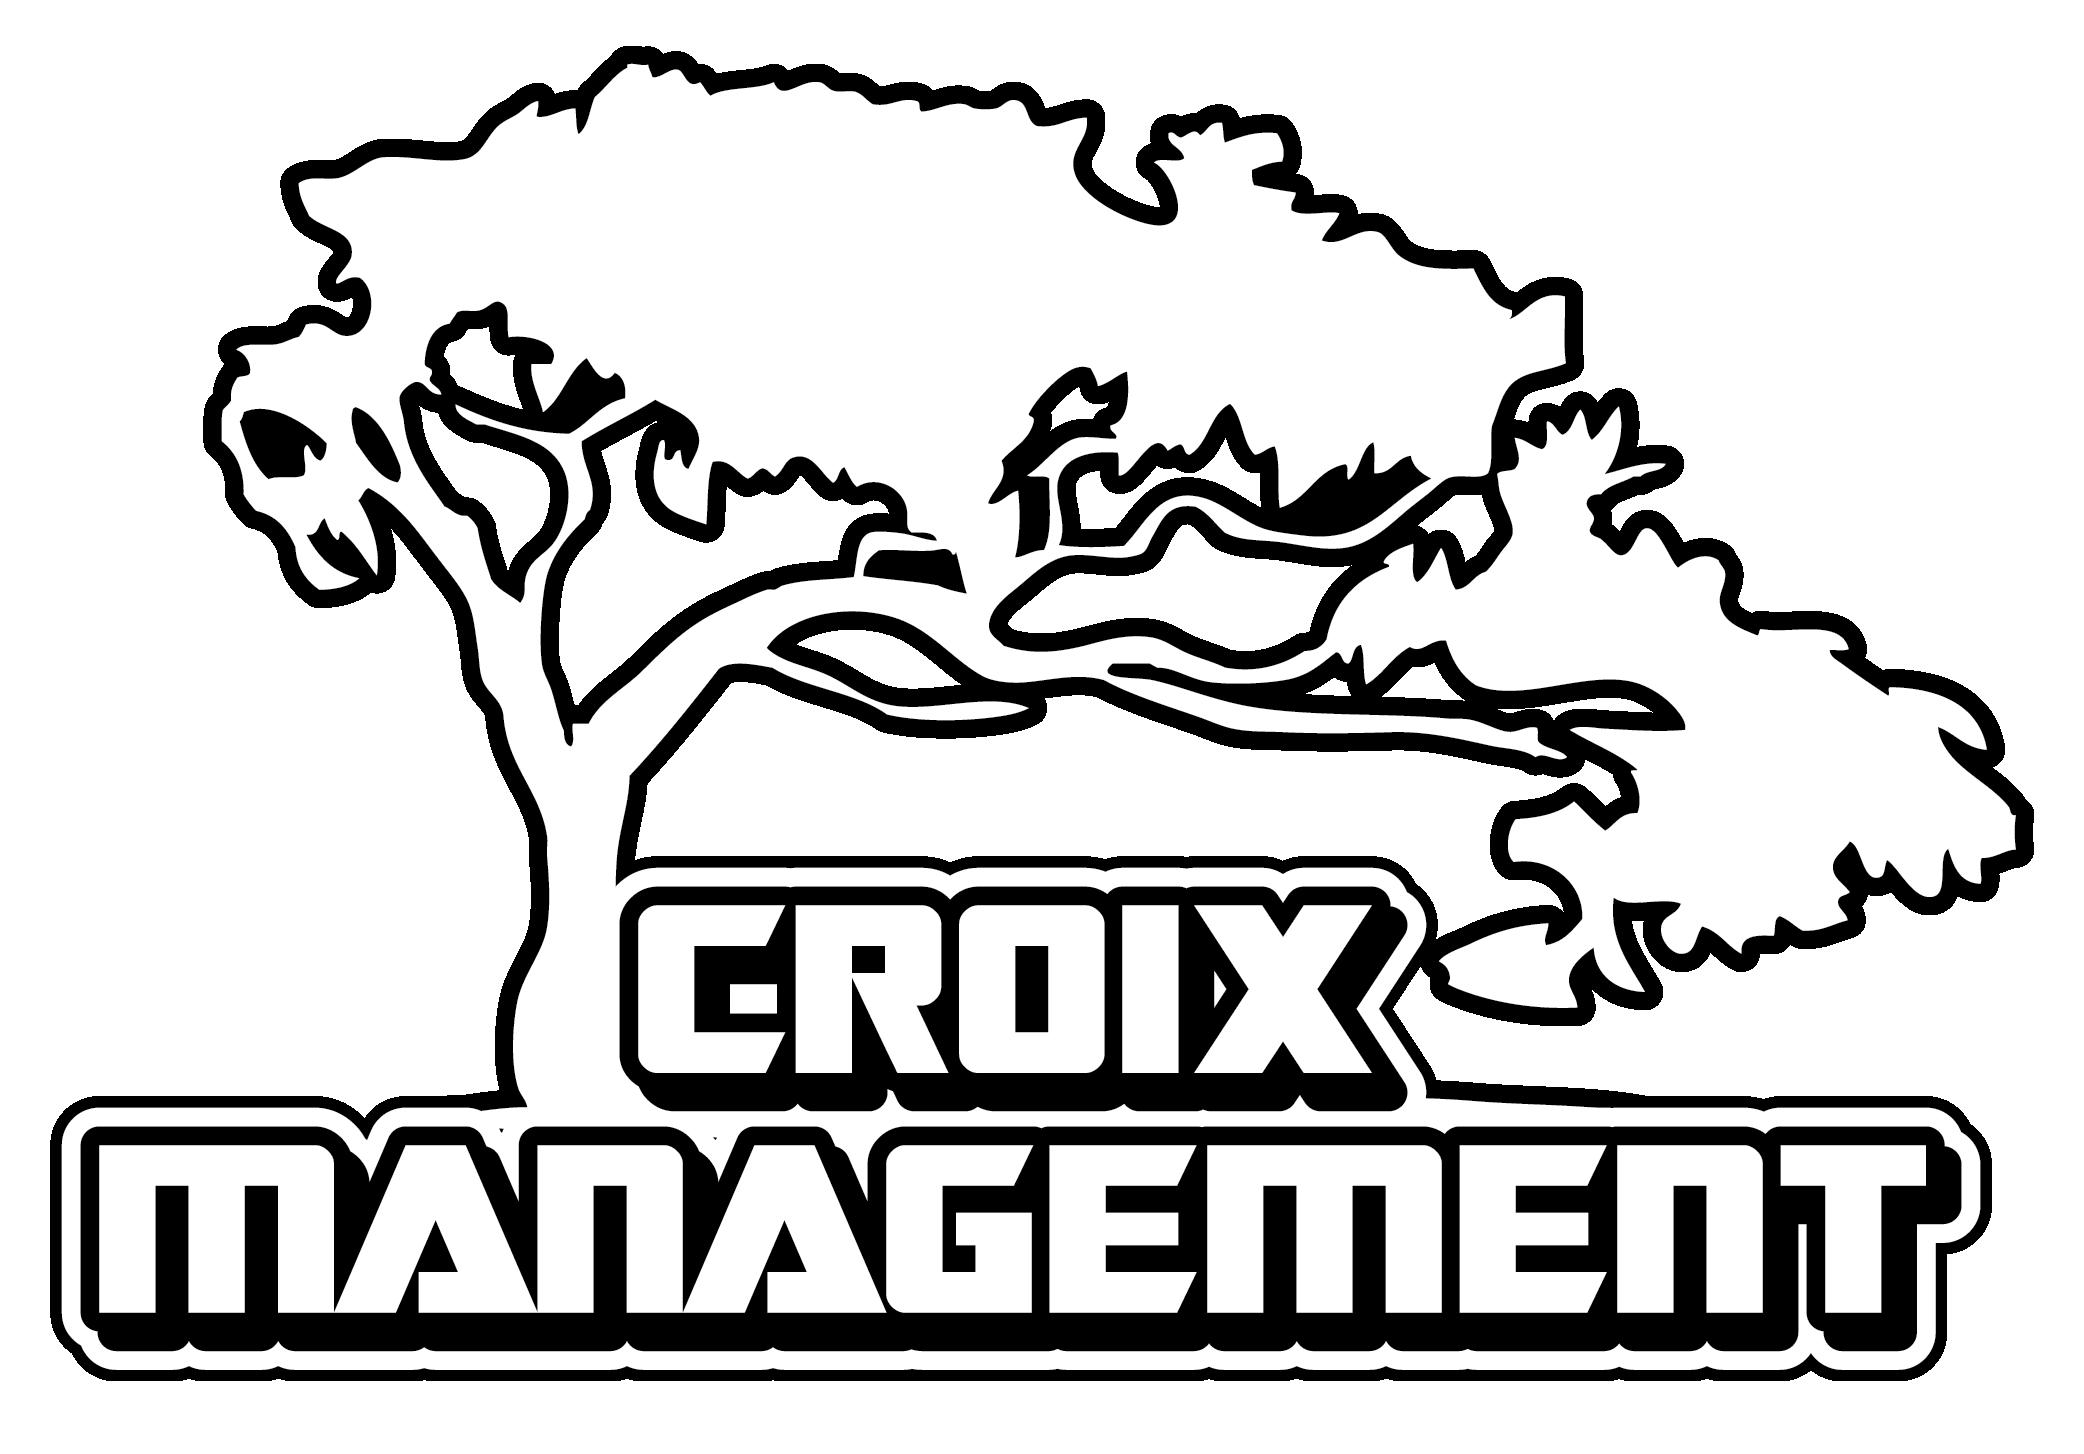 Croix Management, Inc.